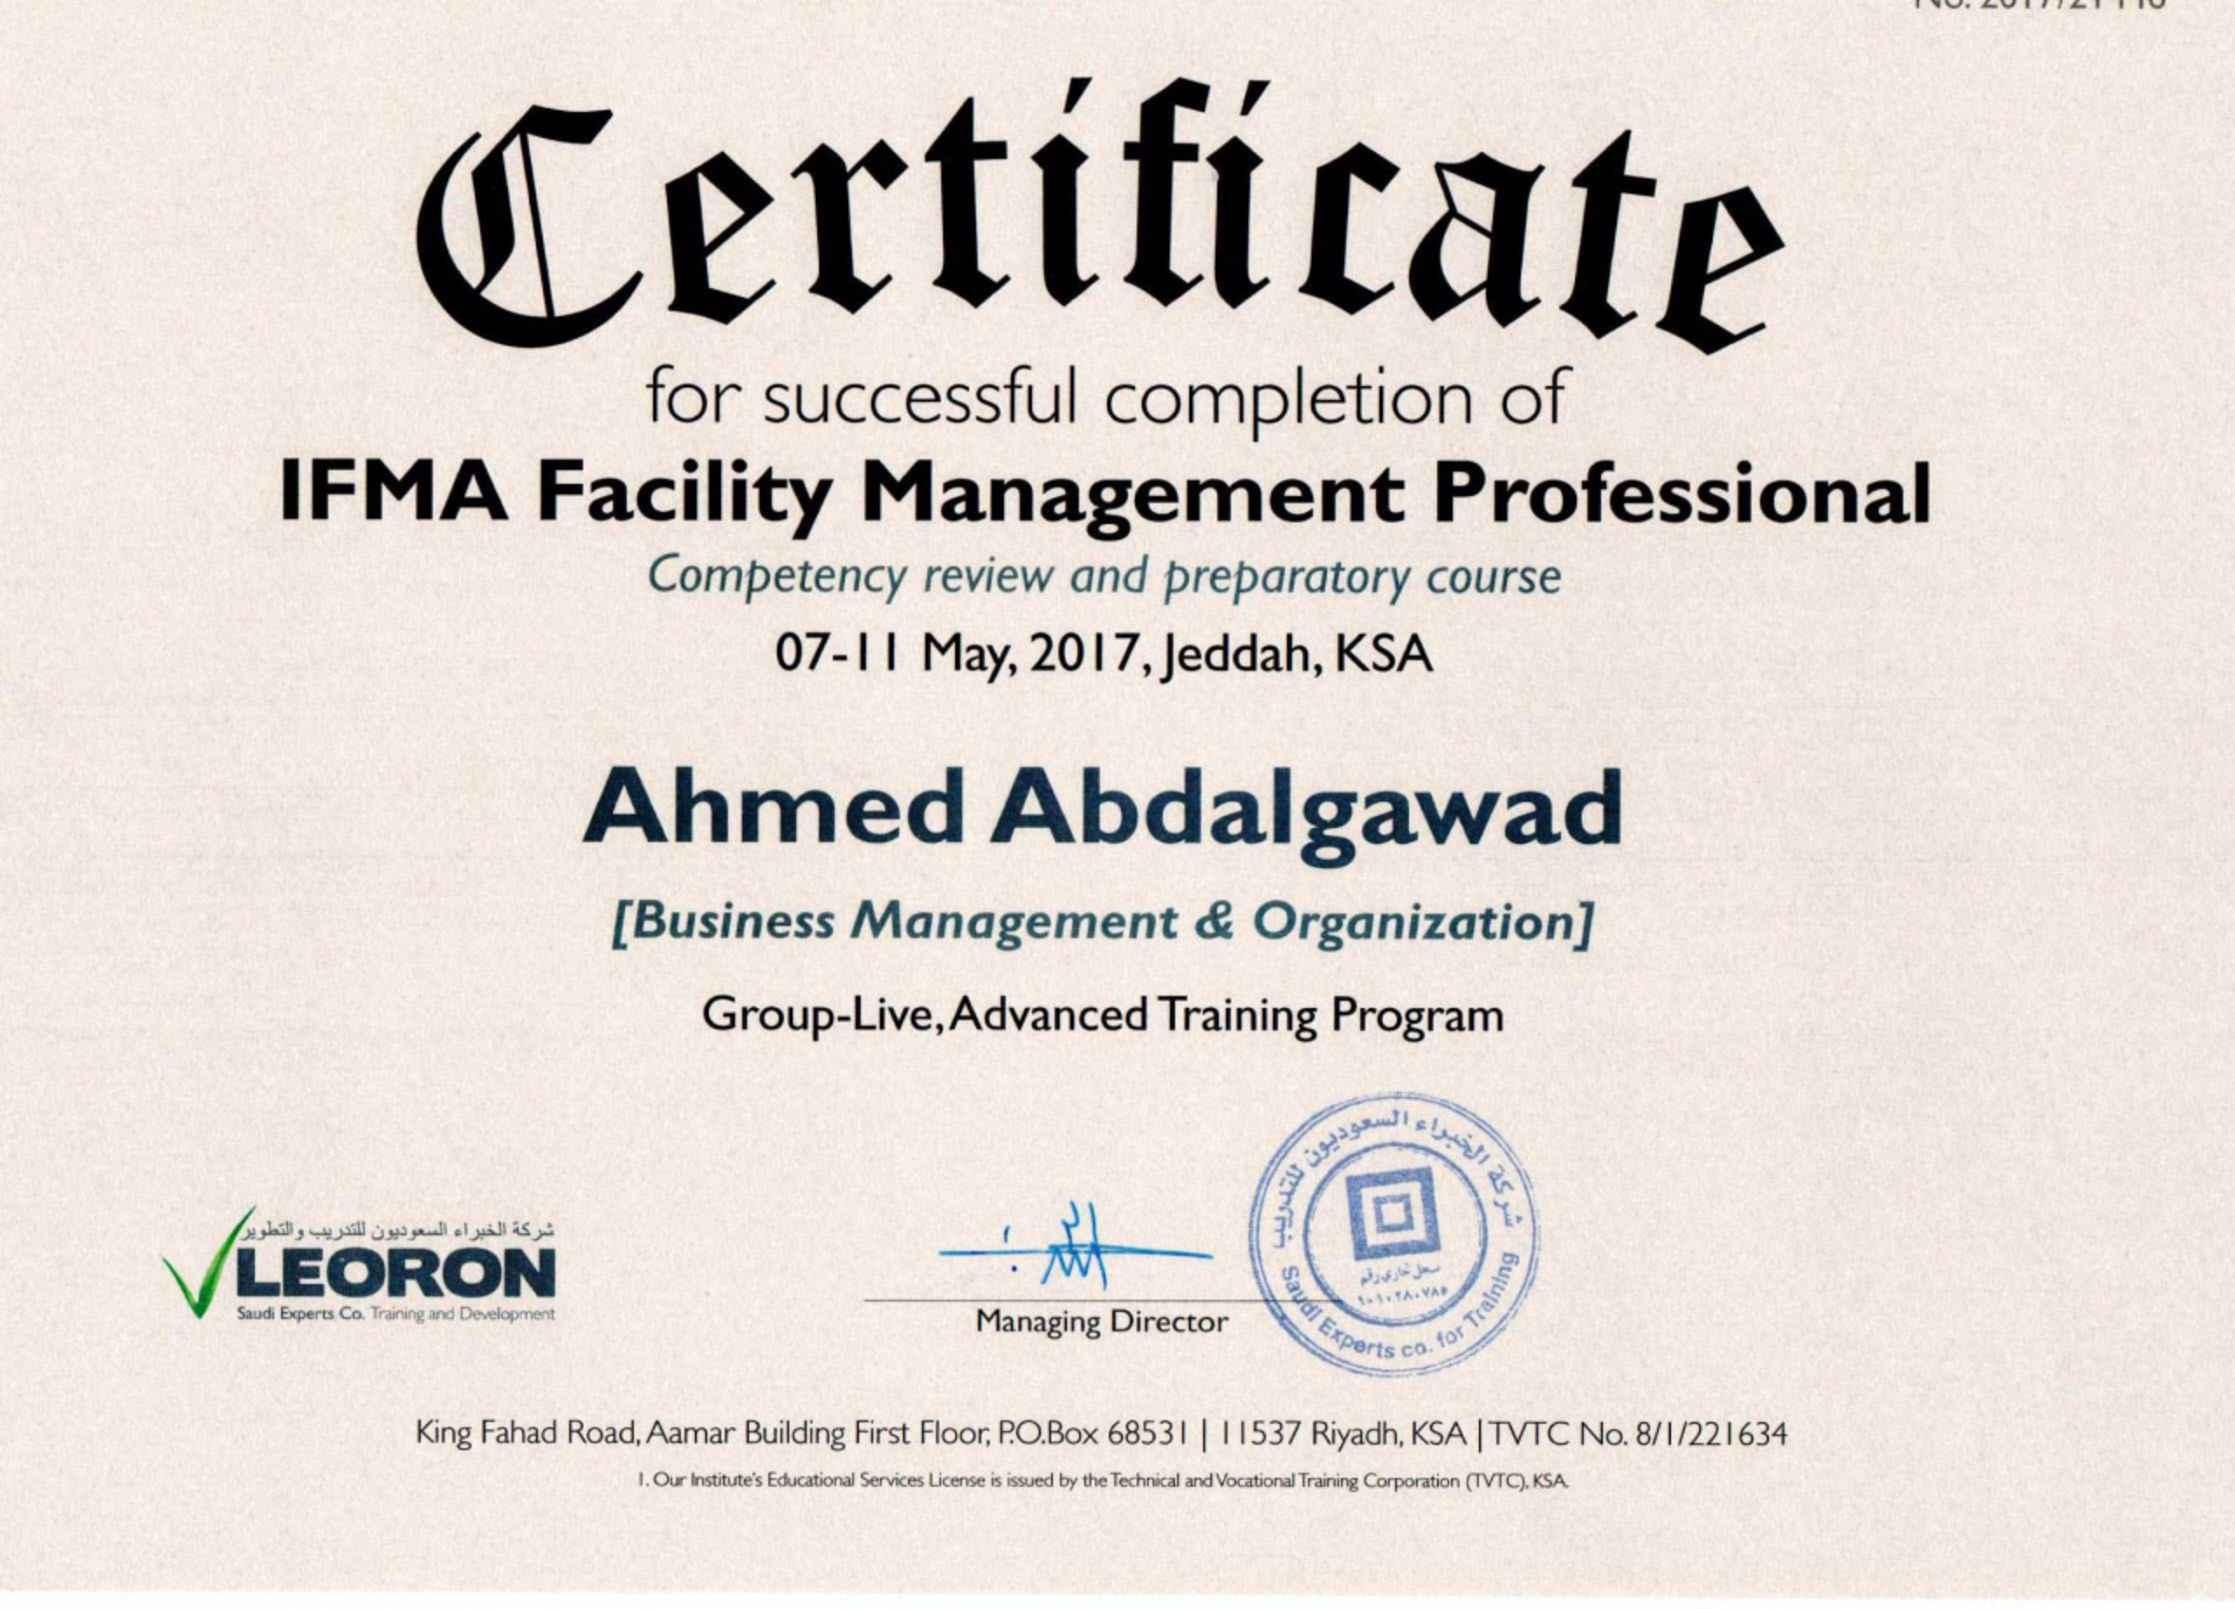 Uci Facilities Management Certificate Best Design Sertificate 2018